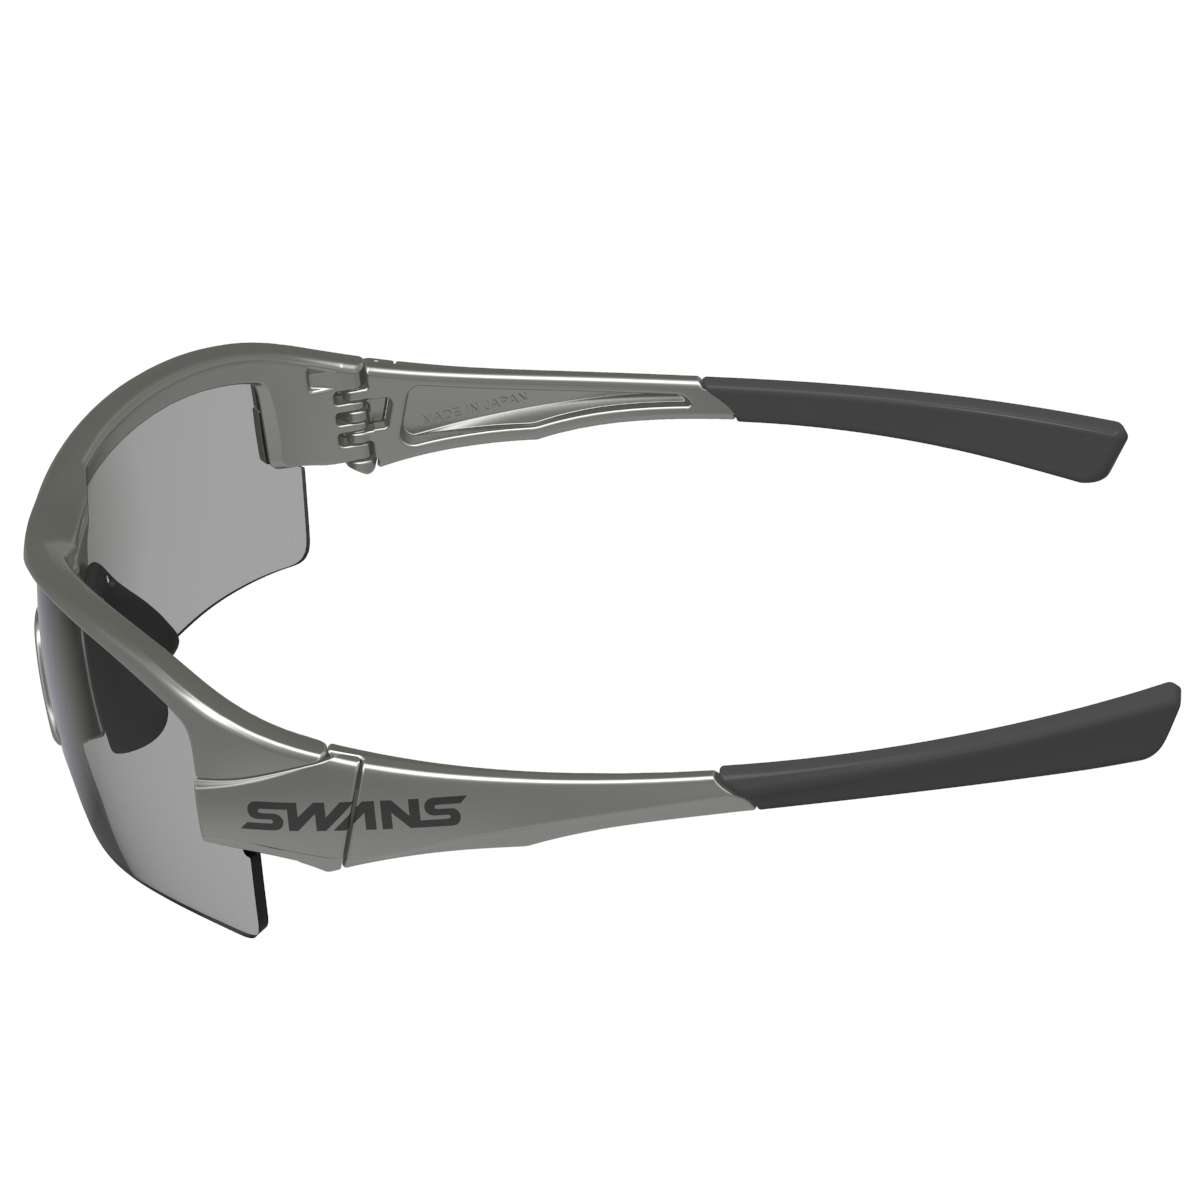 STRIX H-0151 GMR ストリックス・エイチ 偏光レンズモデル